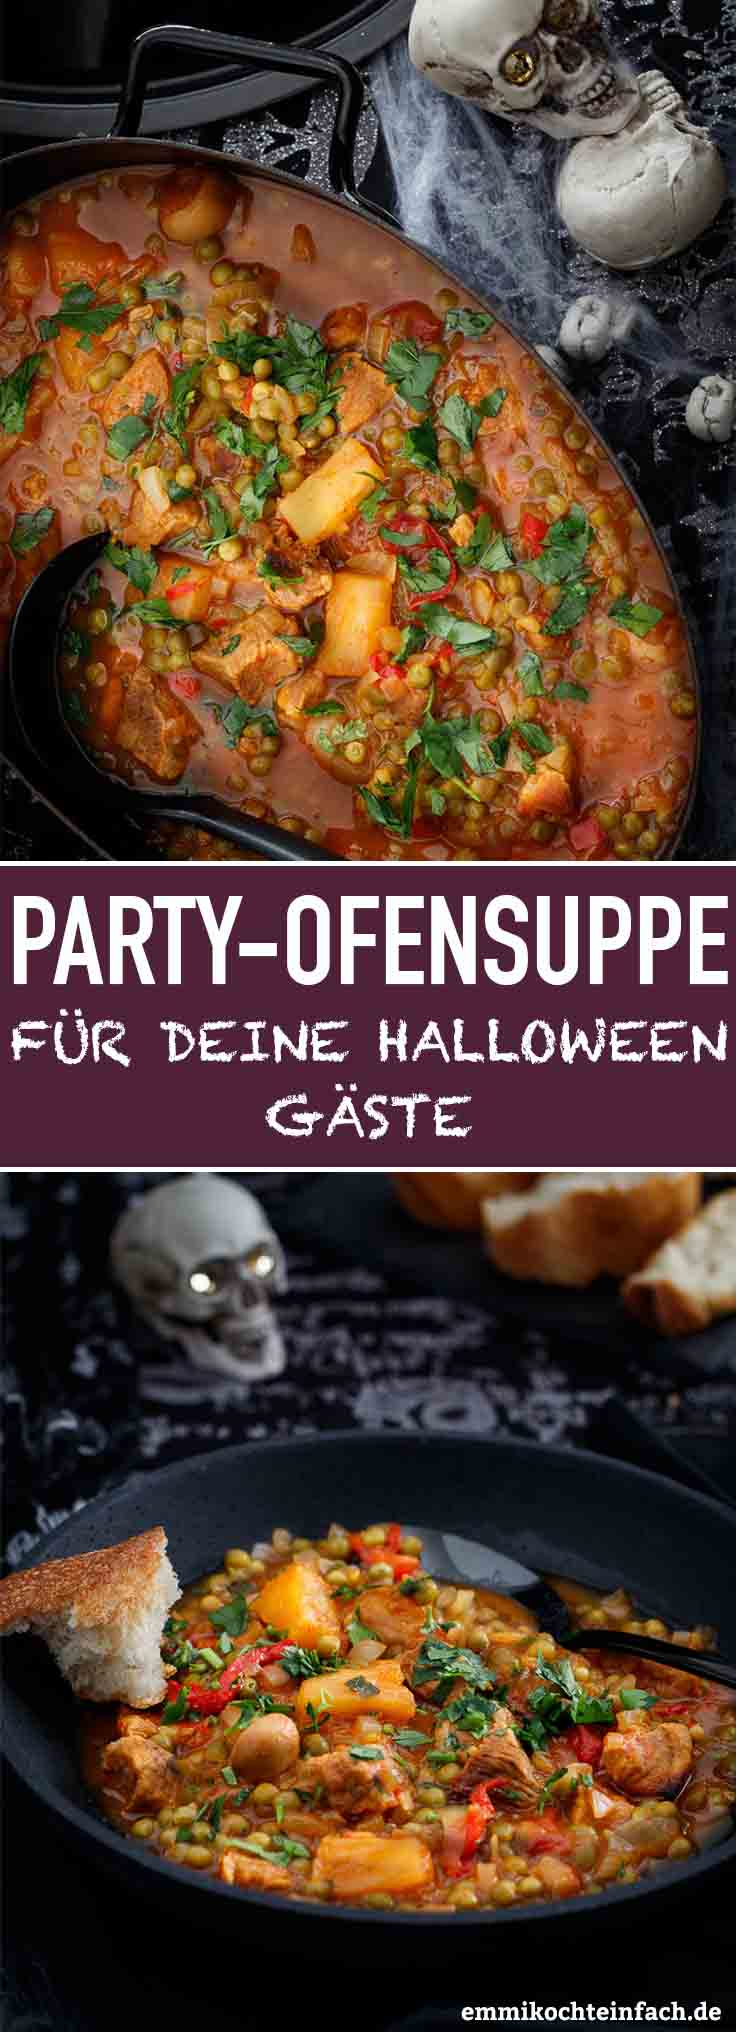 Party-Ofensuppe - www.emmikochteinfach.de